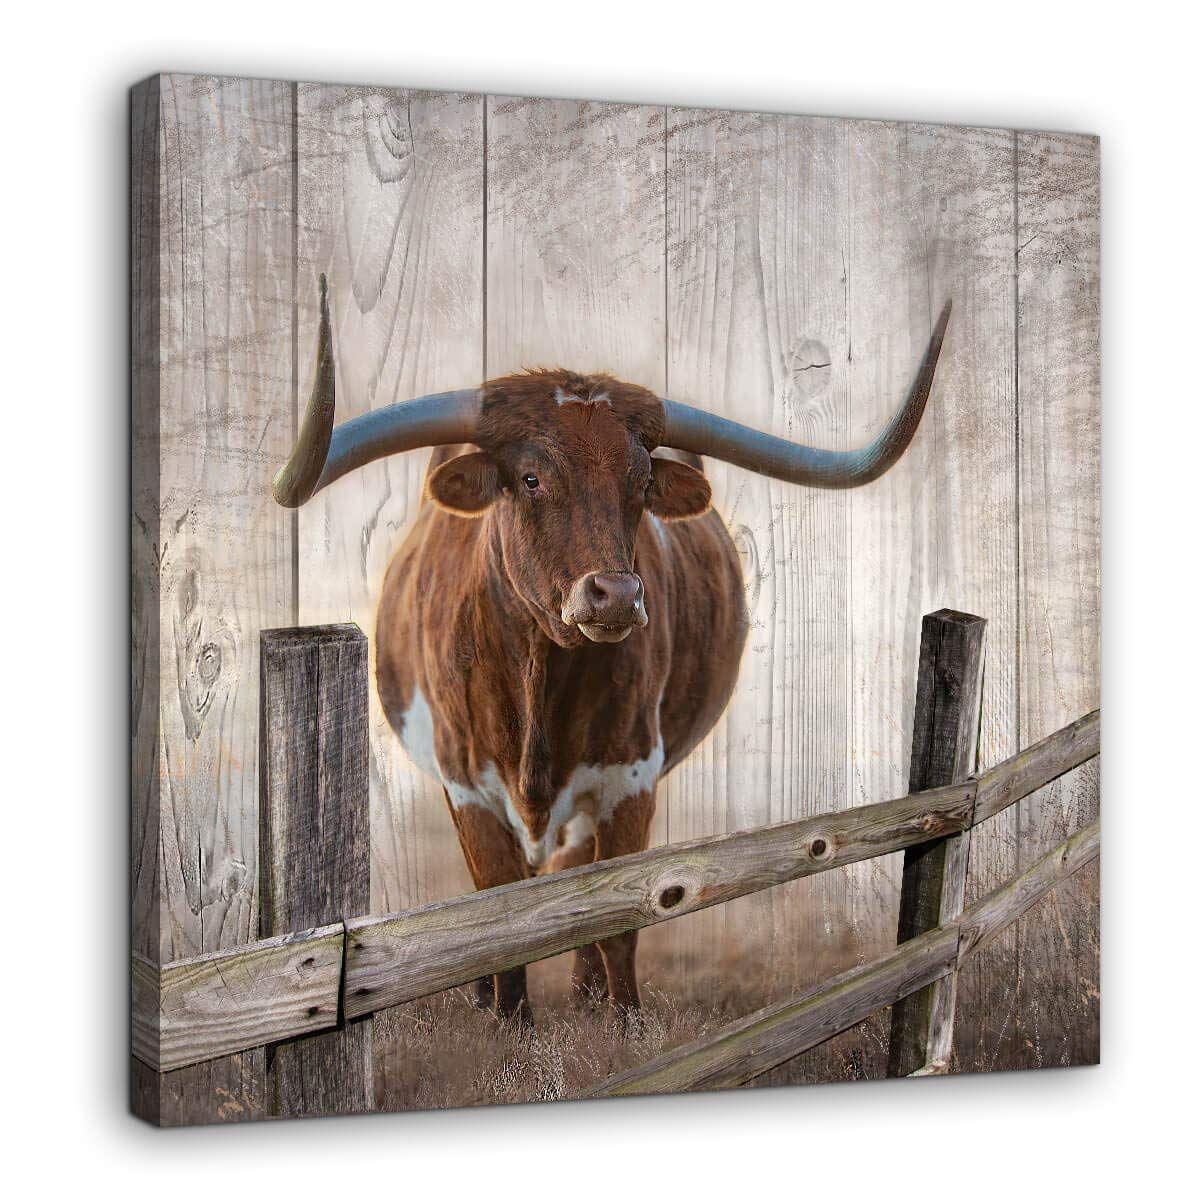 Rustic Wall Decor Canvas Wall Art Of Texas Longhorns For Bathroom Bedroom Wall Decoration Animal Country Farmhous Rustic Wall Decor Rustic Walls Texas Wall Art Texas longhorn bathroom decor